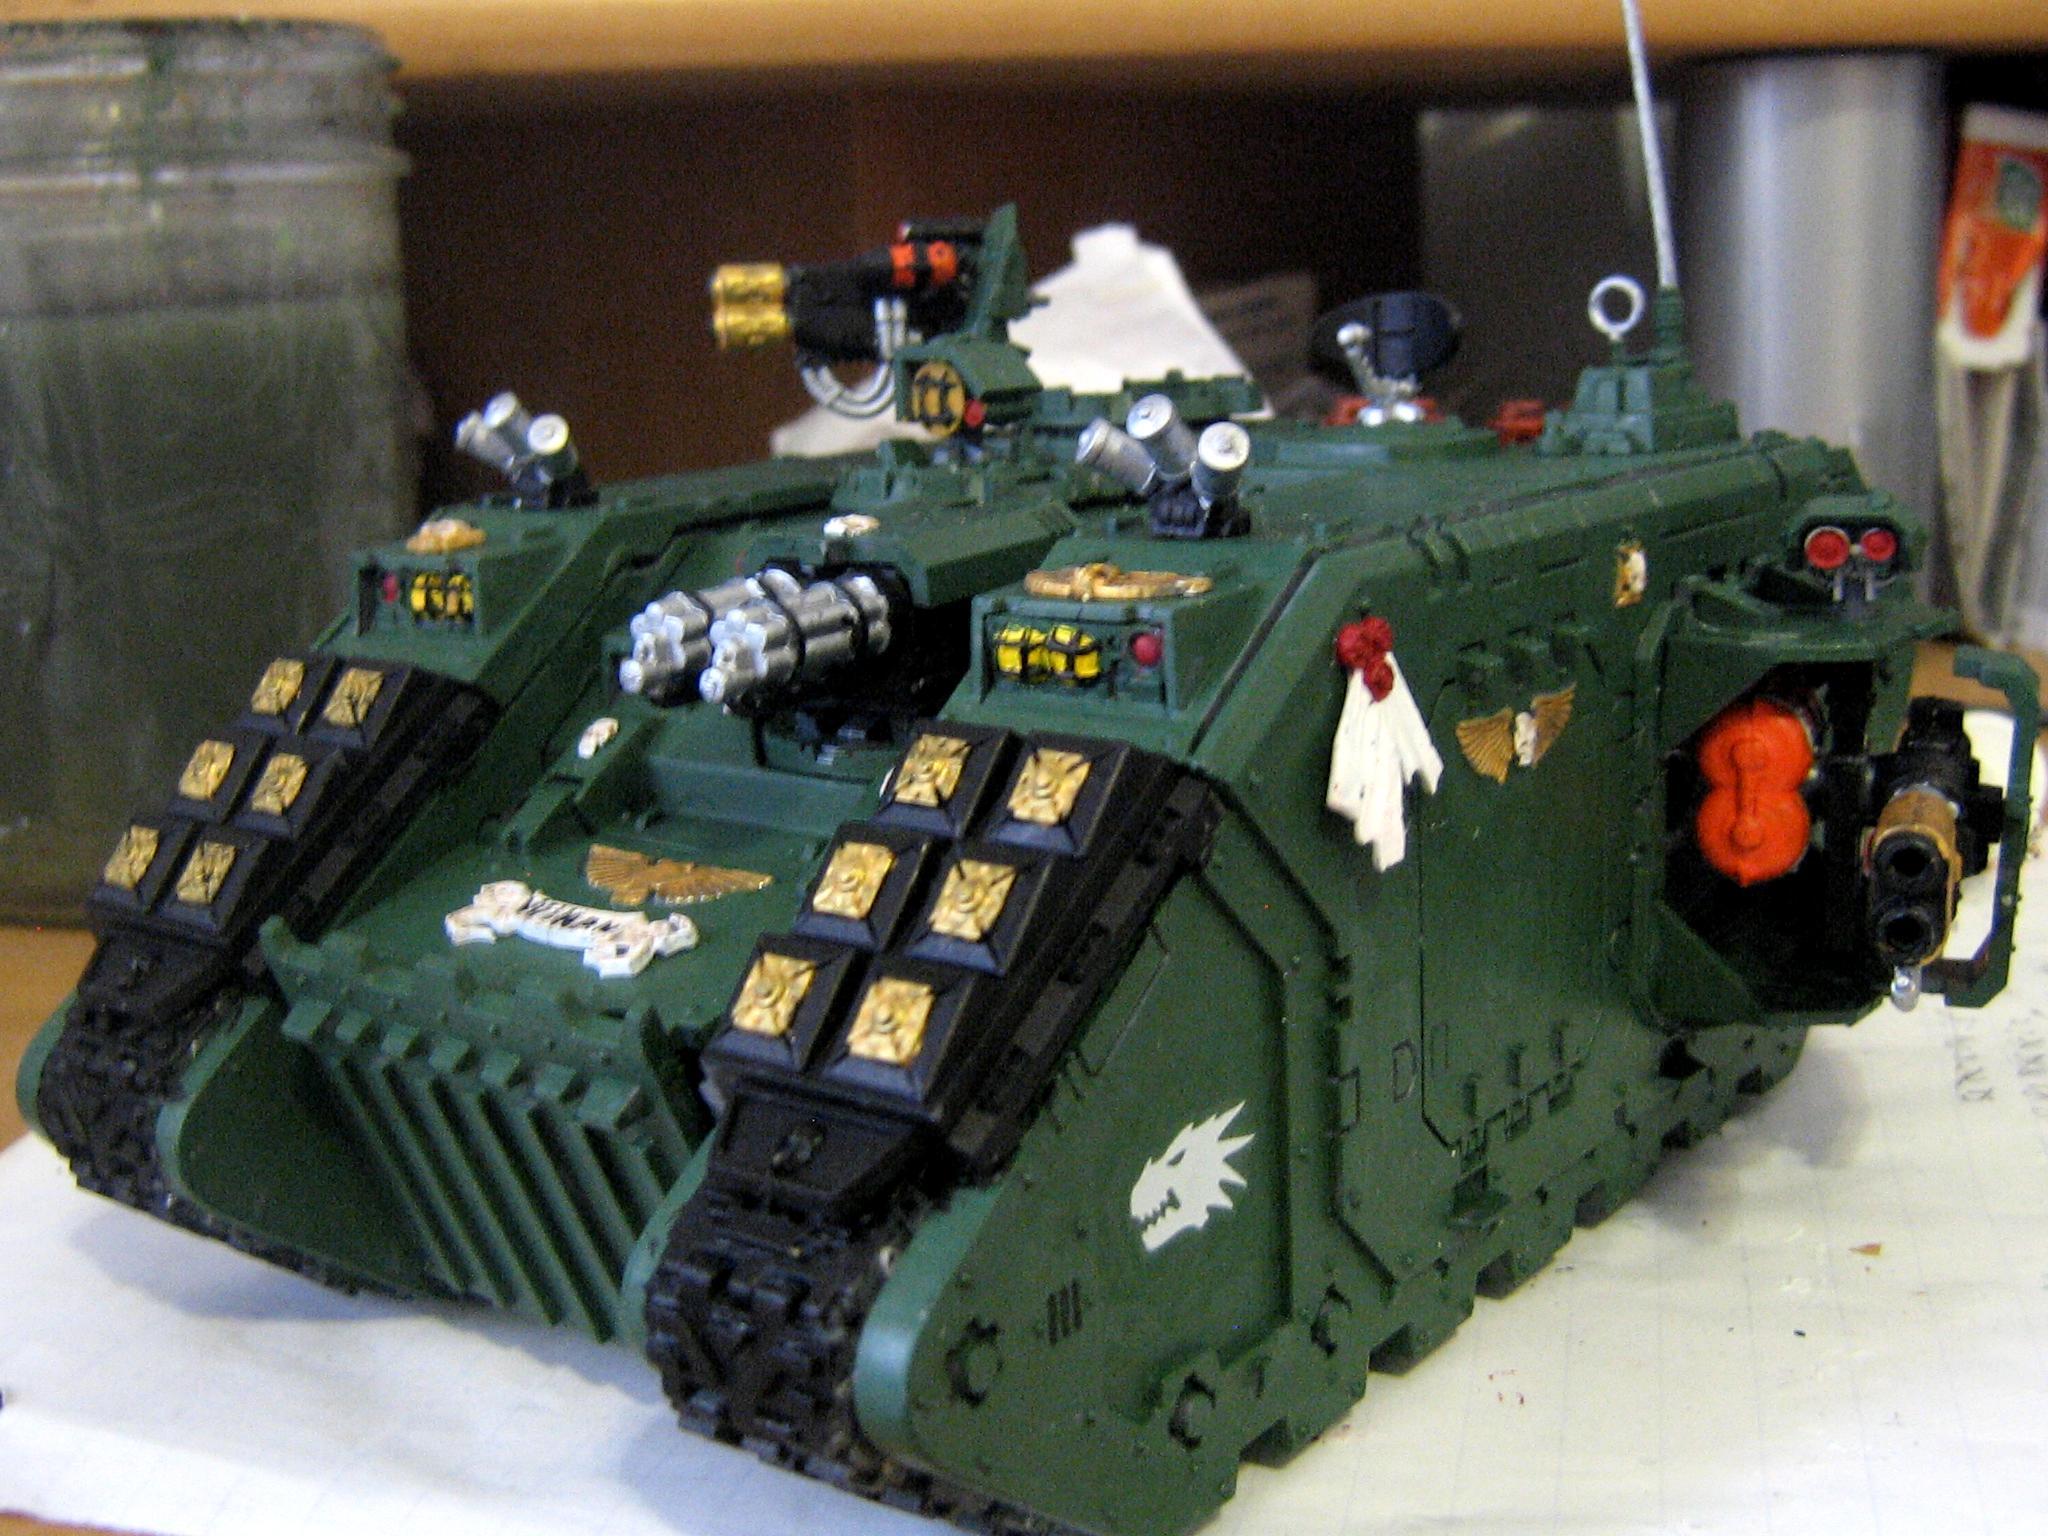 Land Raider, Land Raider Redeemer, Salamanders, Space Marines